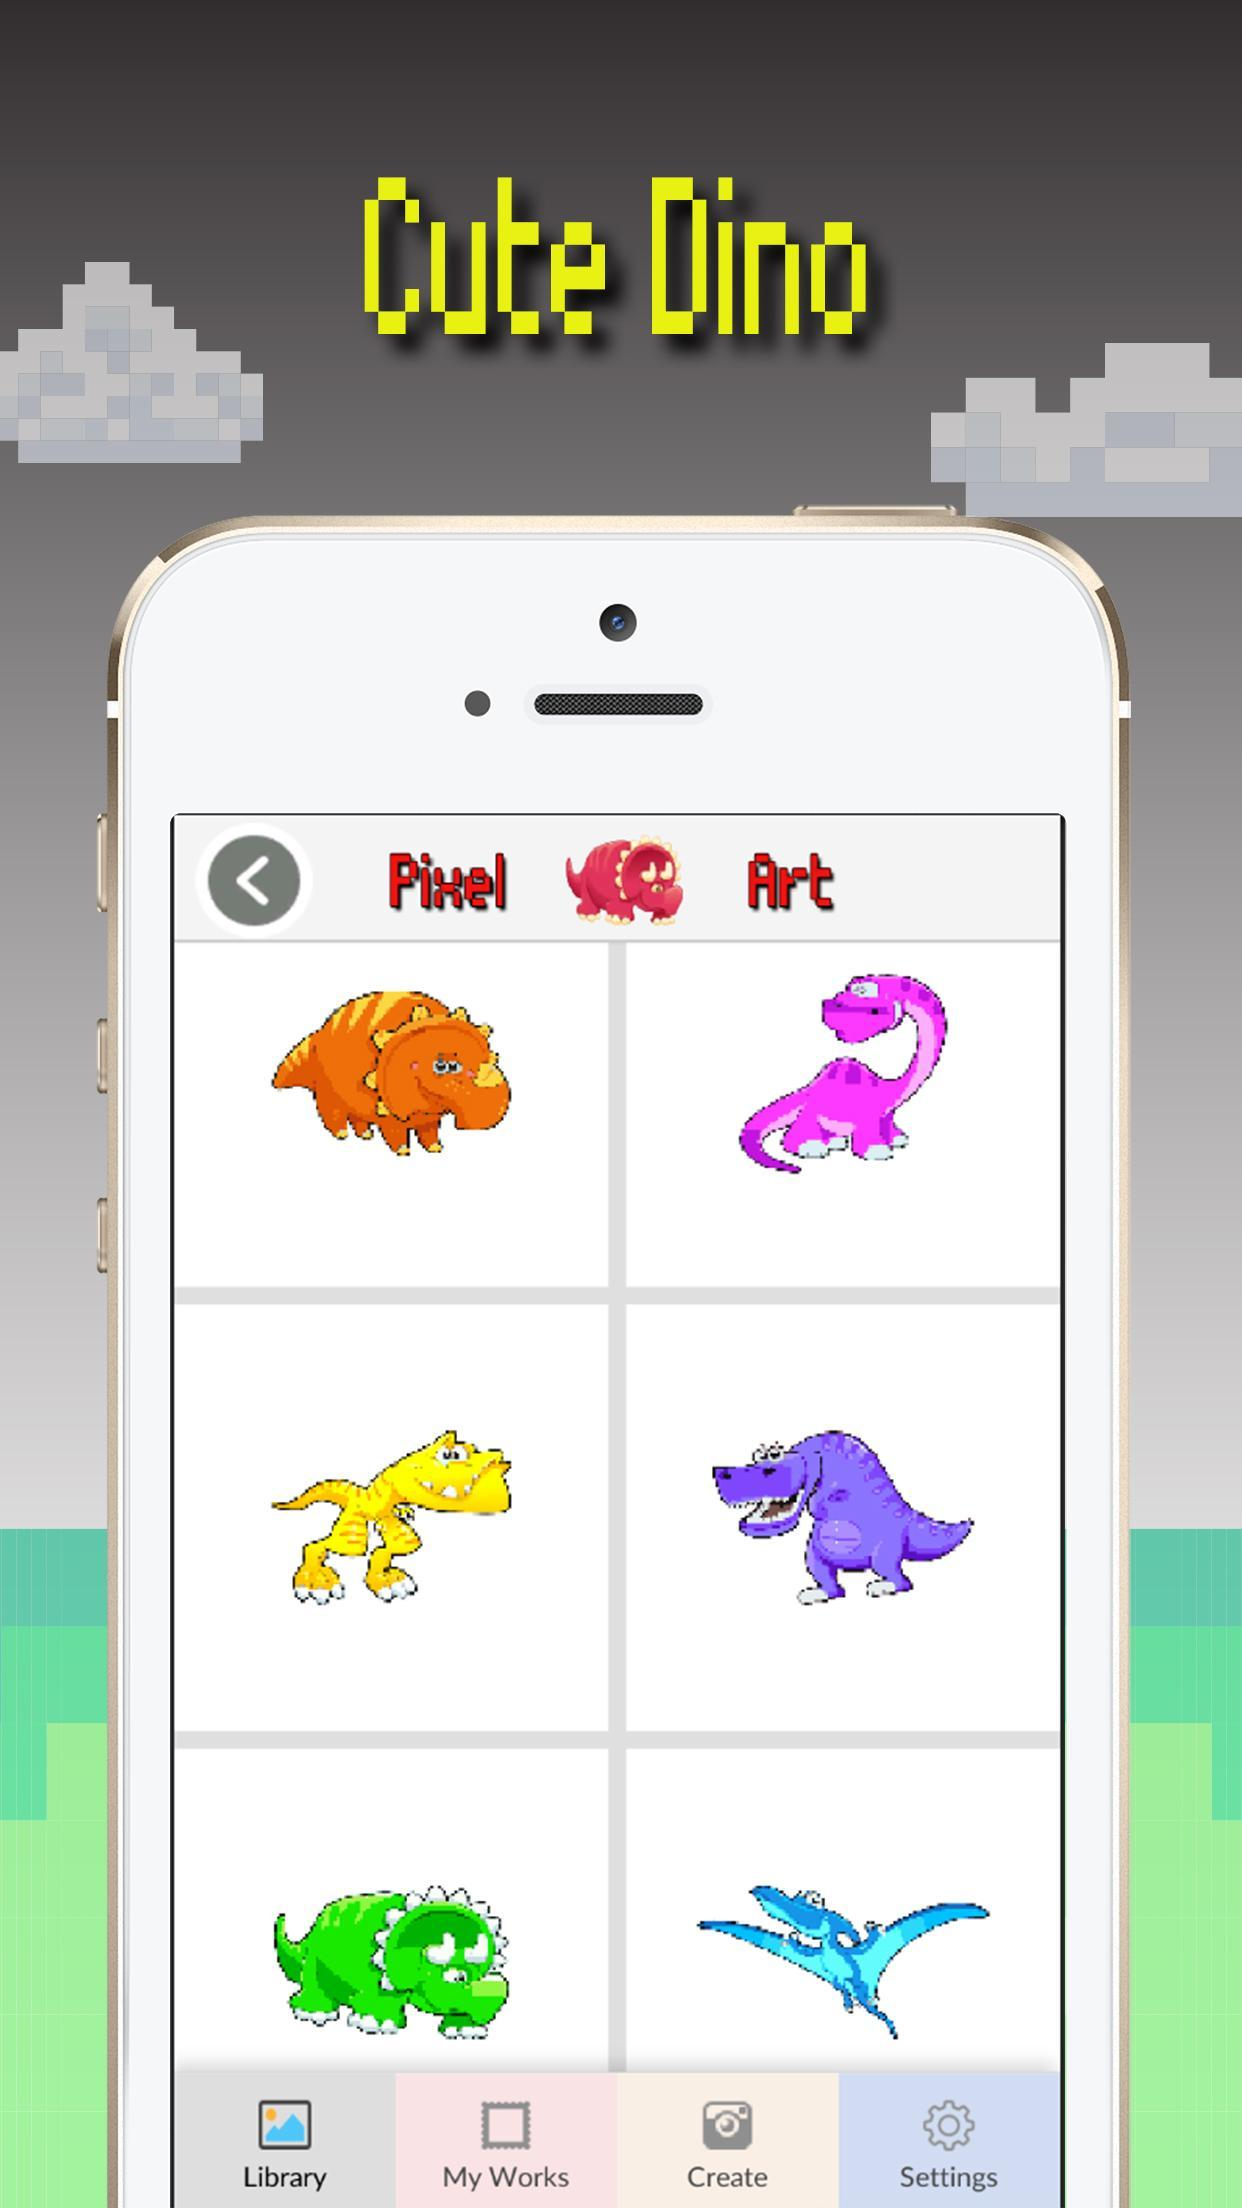 Android Icin Dinozor Renk Piksel Sanat Dino Boyama Oyunu Apk Yi